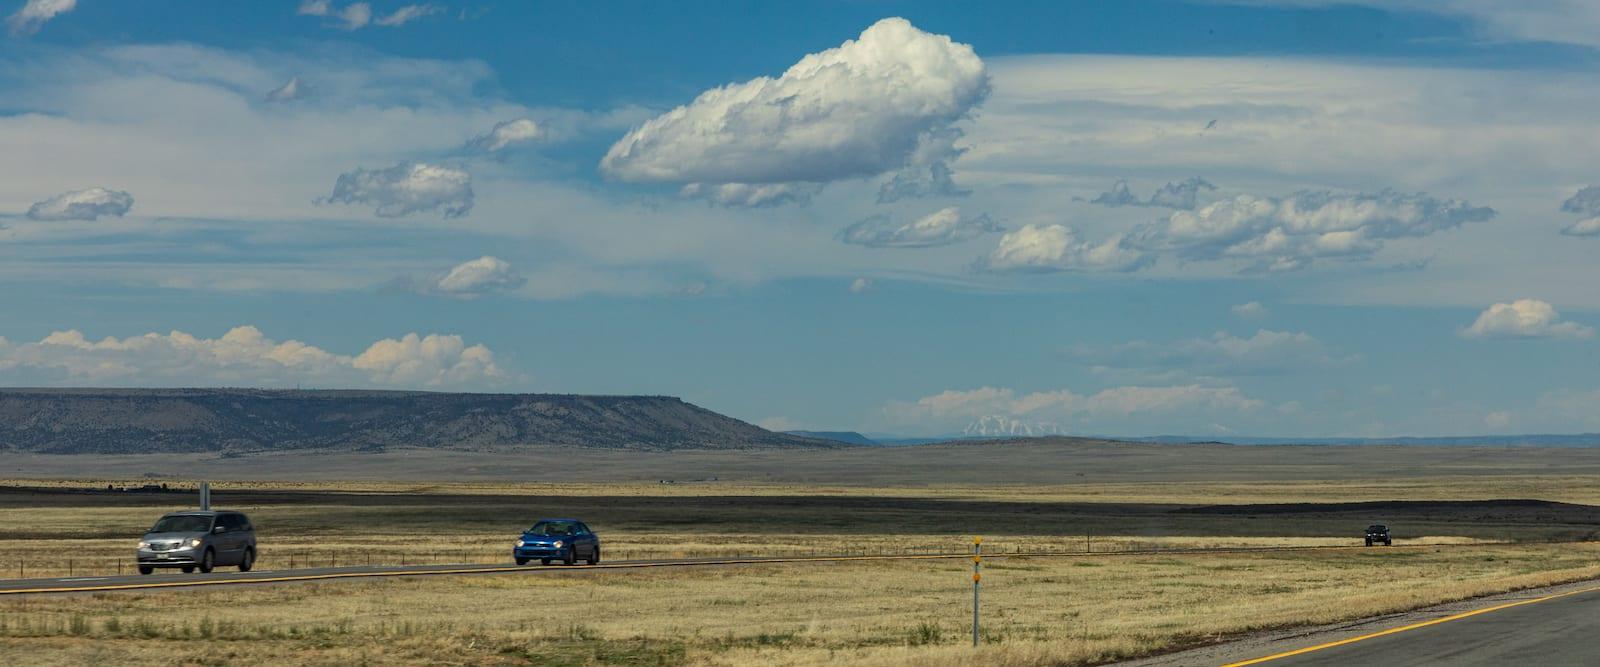 Raton Pass Border Between Colorado and New Mexico I-25